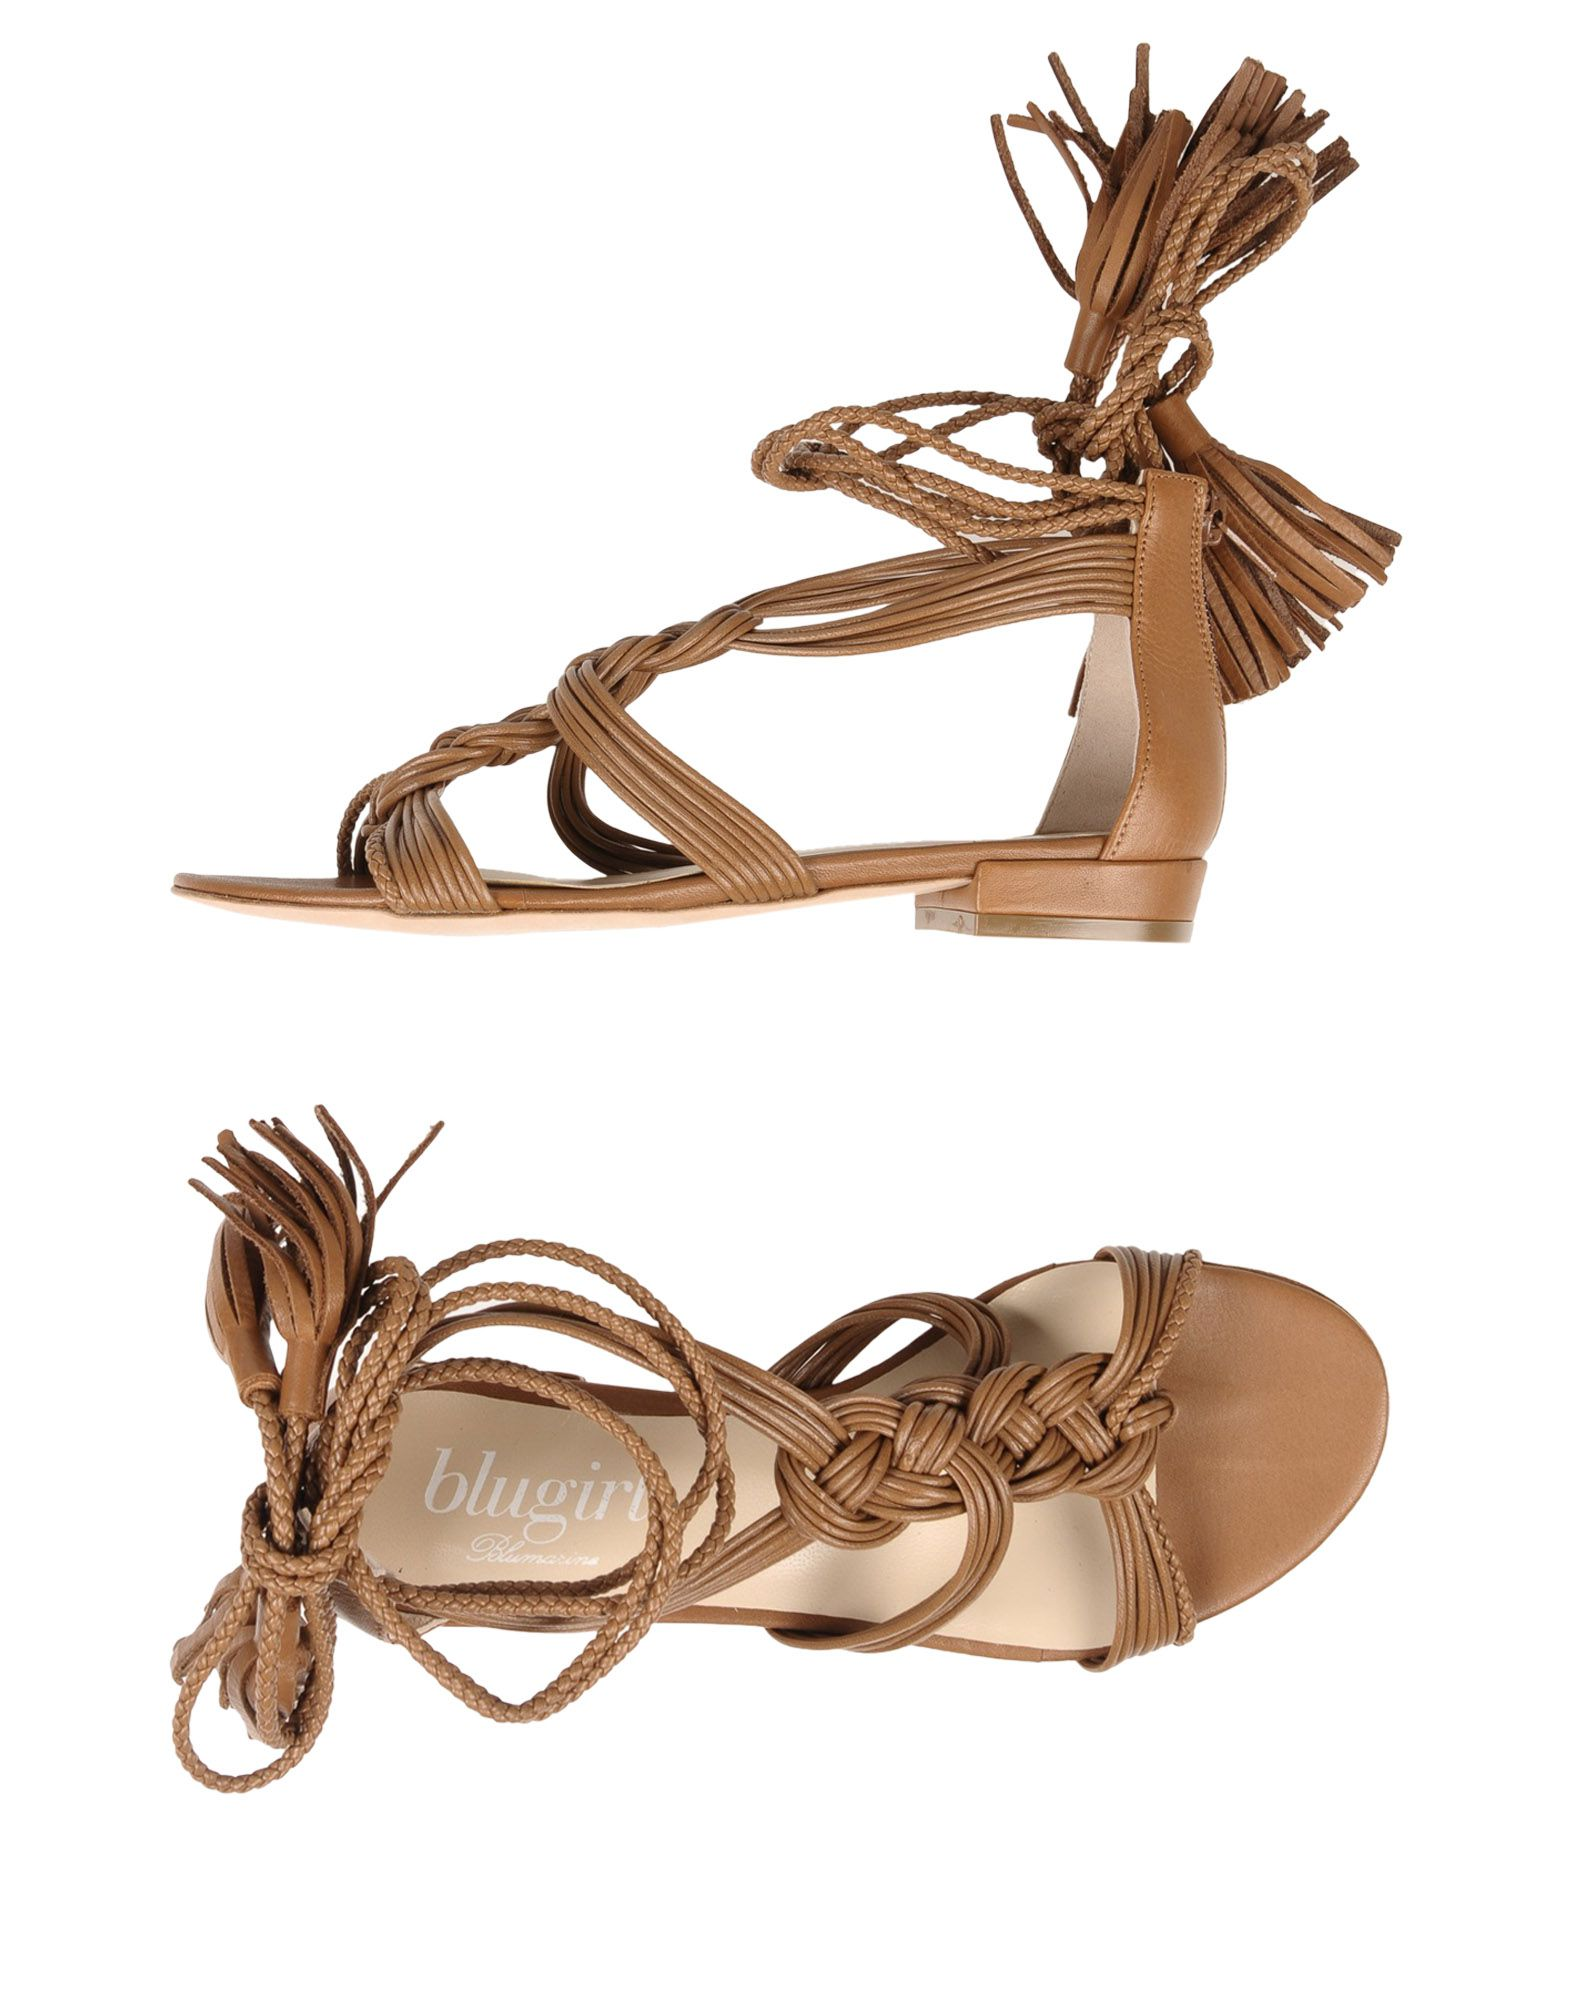 Blugirl Blumarine Sandalen Damen  11416366BM Gute Qualität beliebte Schuhe